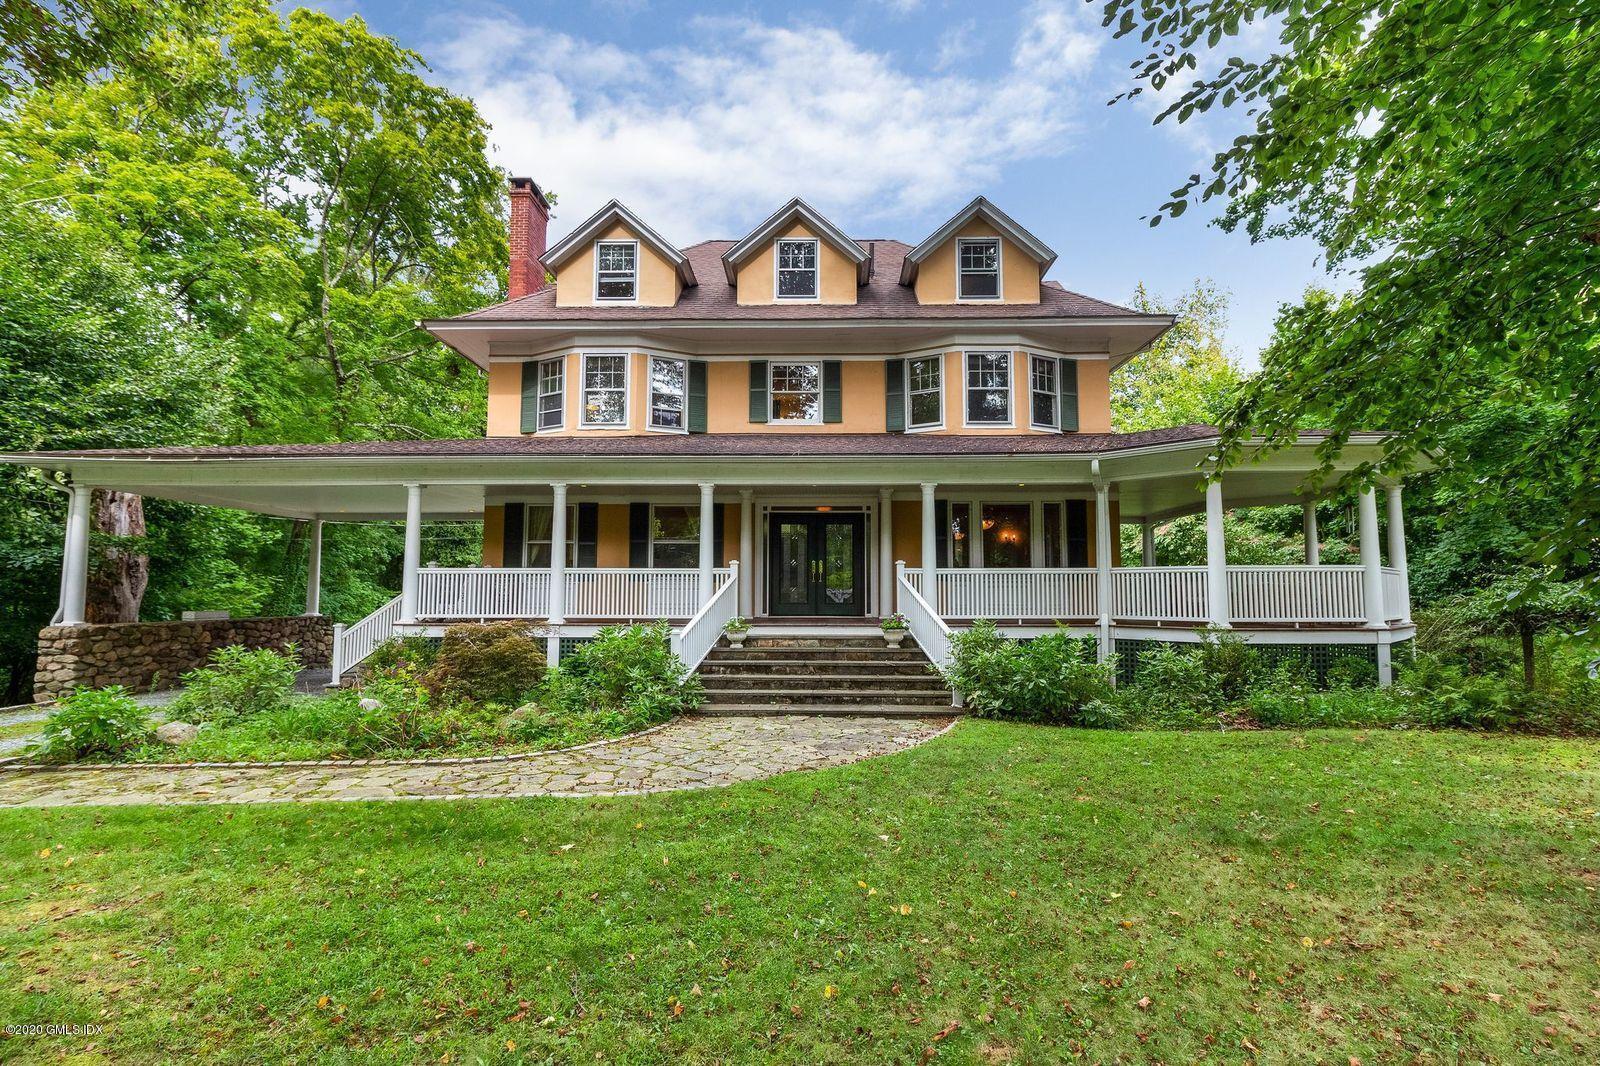 505 Putnam Avenue, Greenwich, Connecticut 06830, 5 Bedrooms Bedrooms, ,3 BathroomsBathrooms,Single family,For sale,Putnam,111201